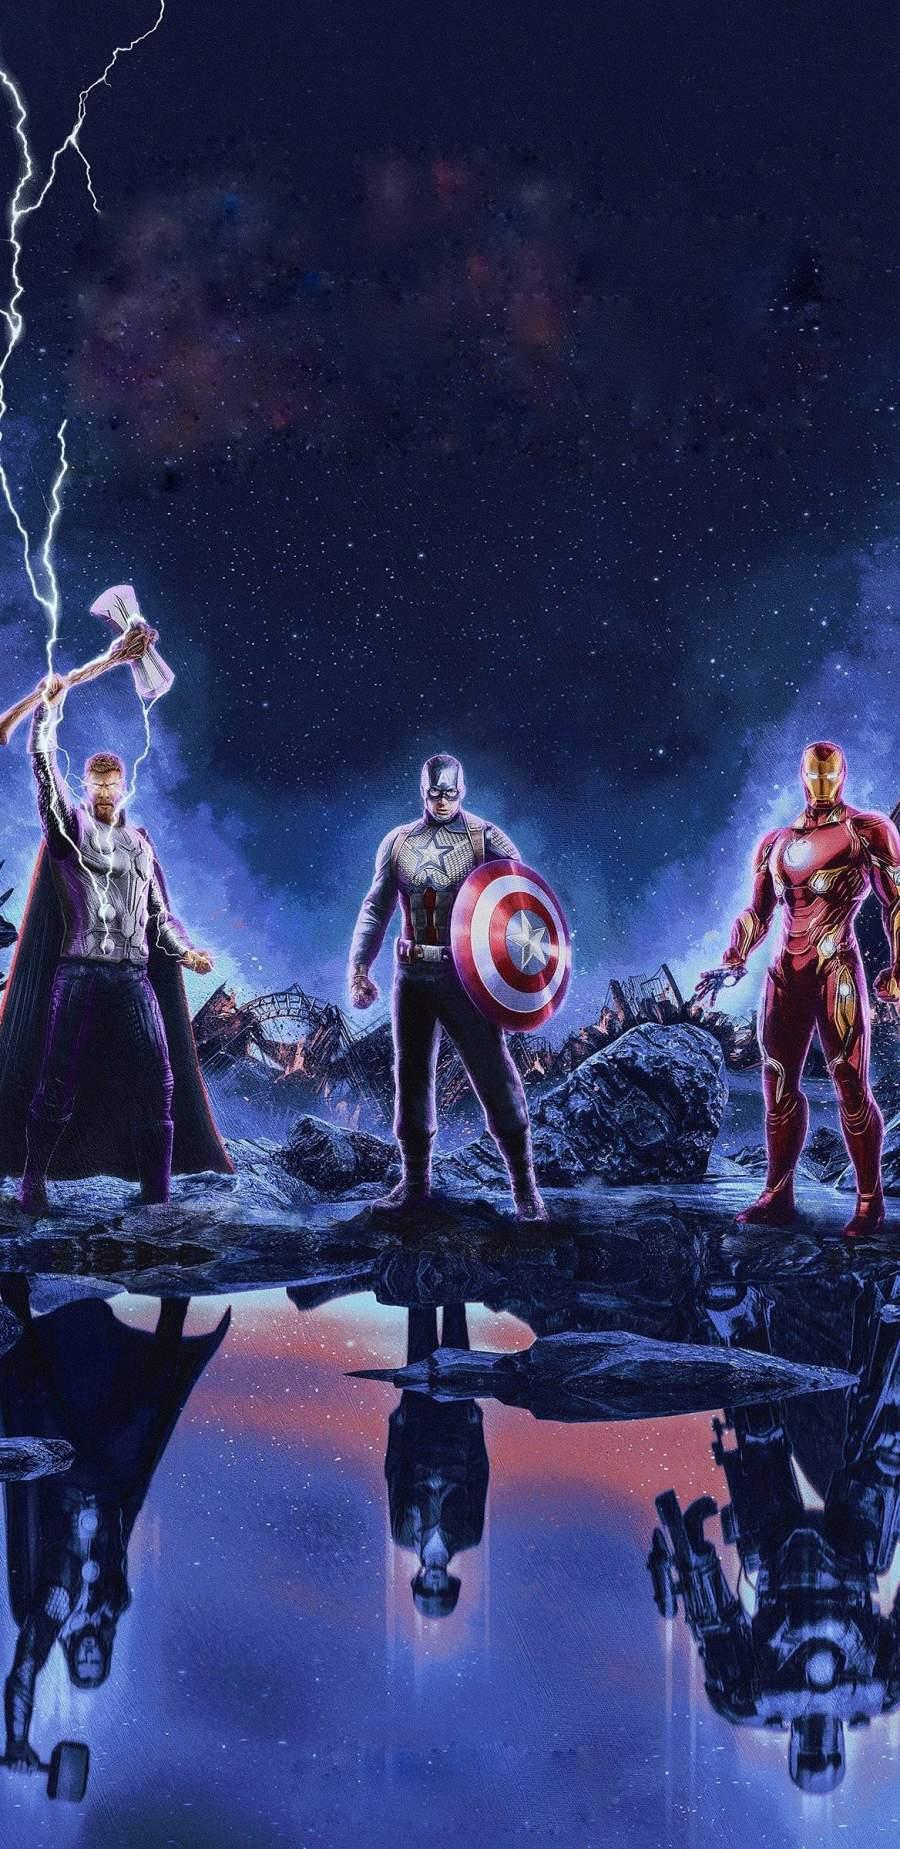 Strongest Avengers iPhone Wallpaper